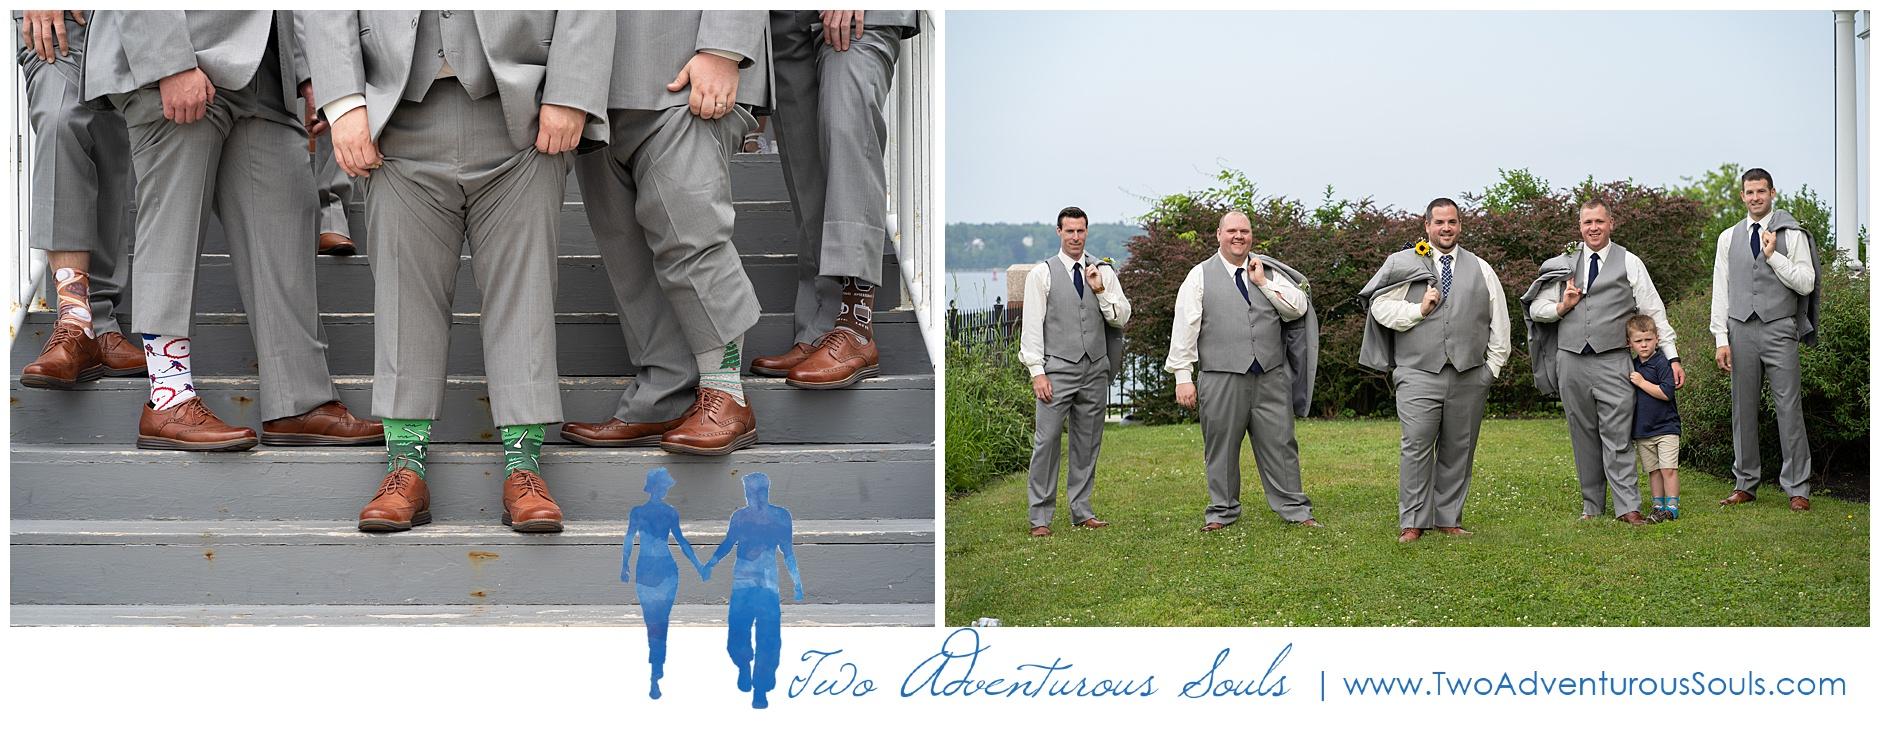 Maine Wedding Photographers, SMCC Wedding Photographers, Southern Maine Community College Wedding Photographers, Two Adventurous Souls-AshleyAaron_0020.jpg